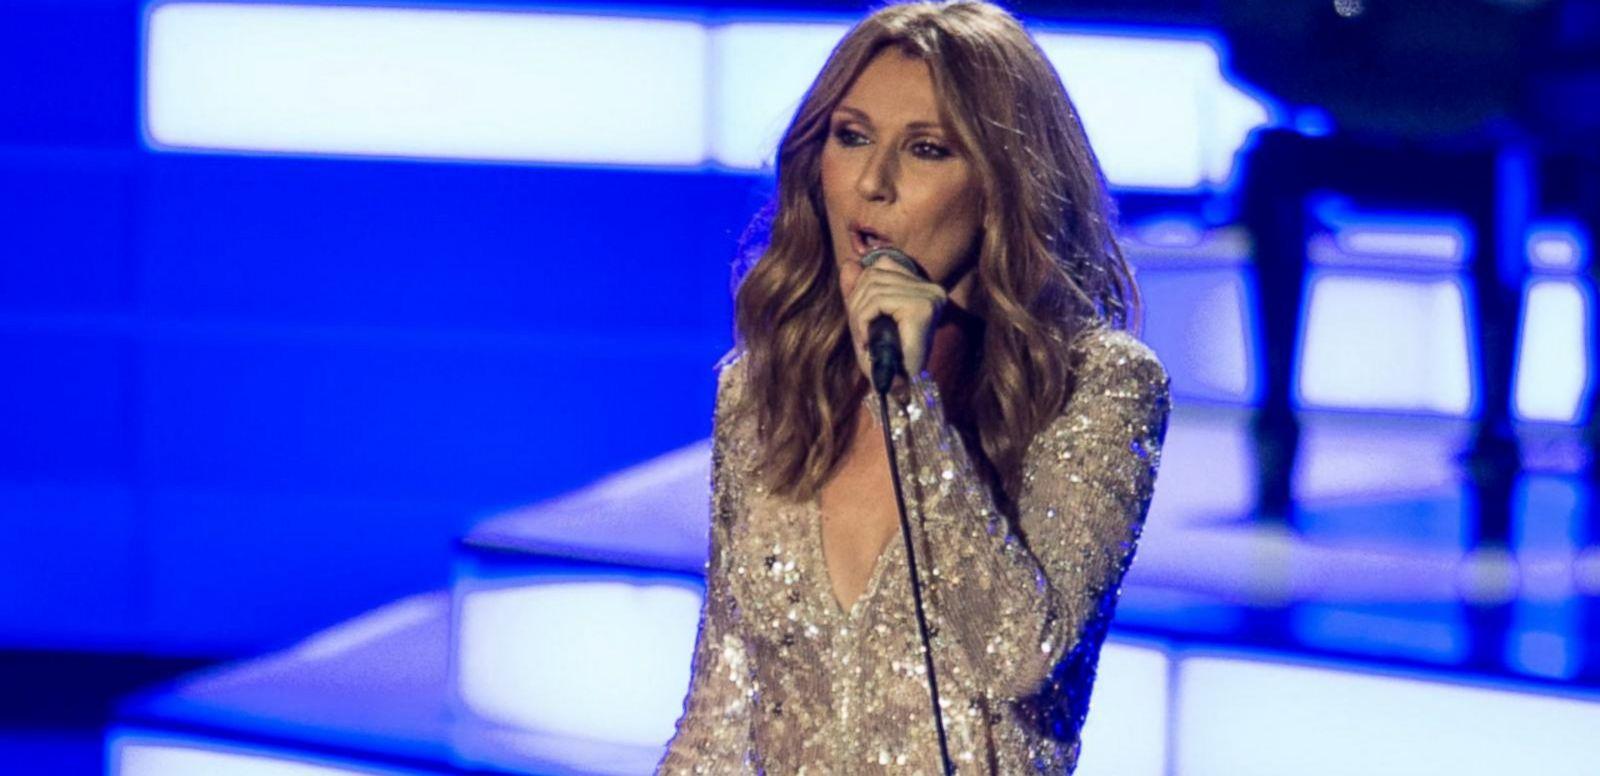 VIDEO: Celine Dion's Emotional Return to the Las Vegas Stage